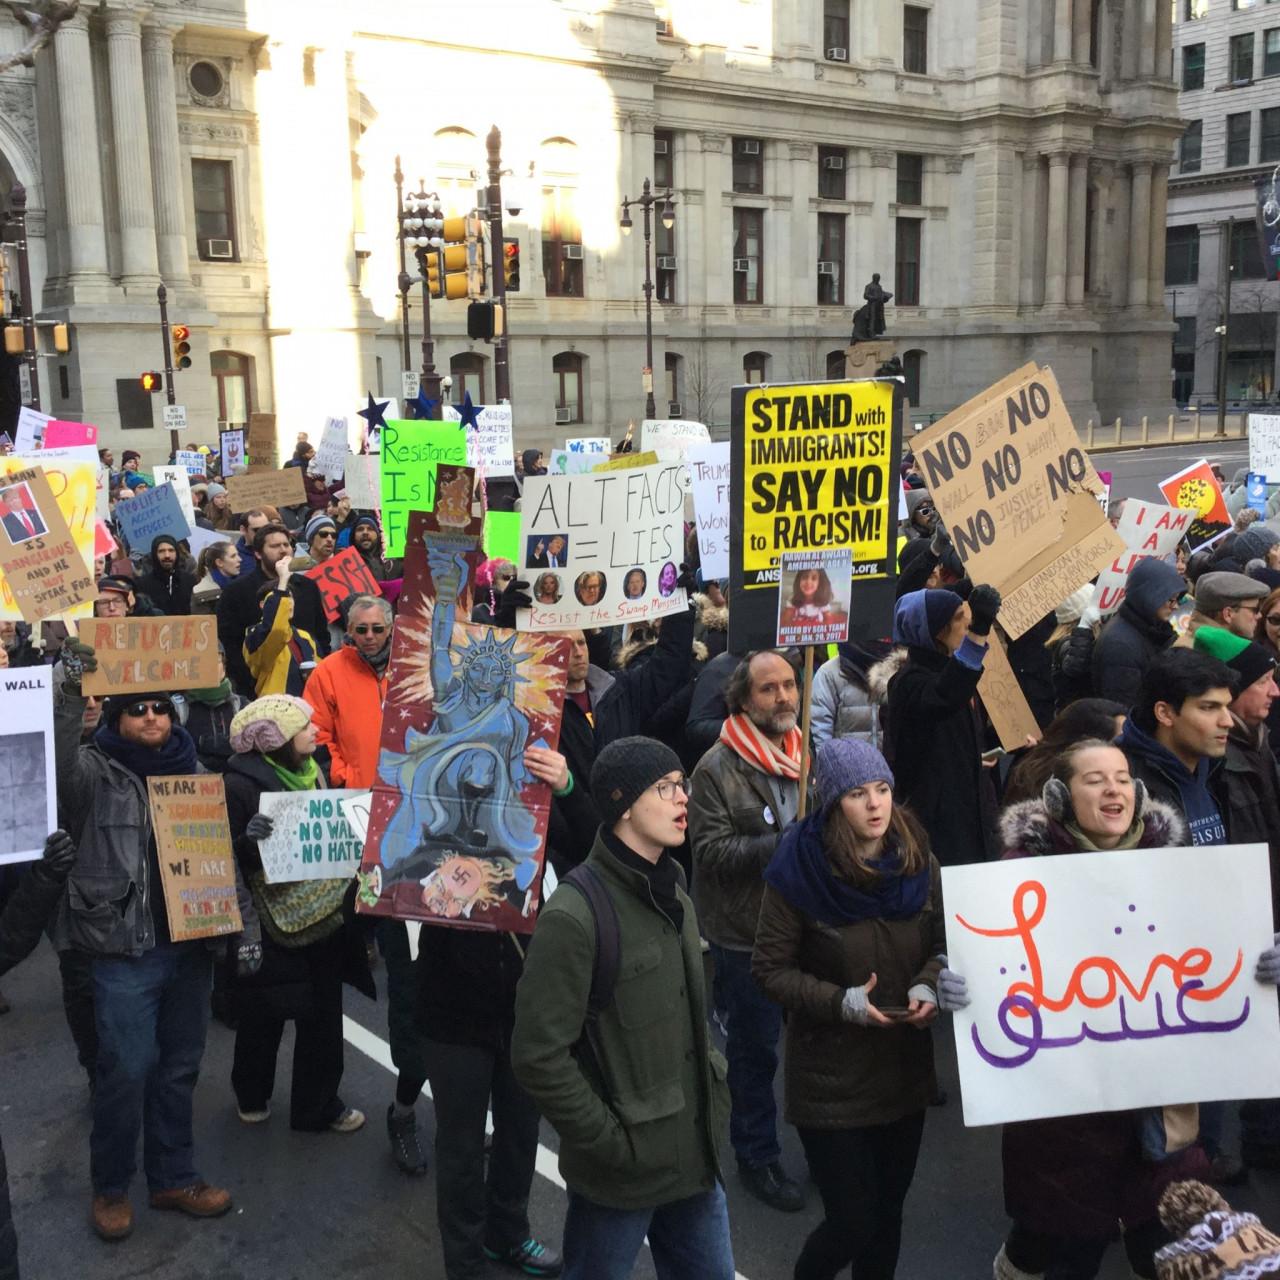 Immigrant Rights Protest - Philadelphia - February 4, 2017 - Love